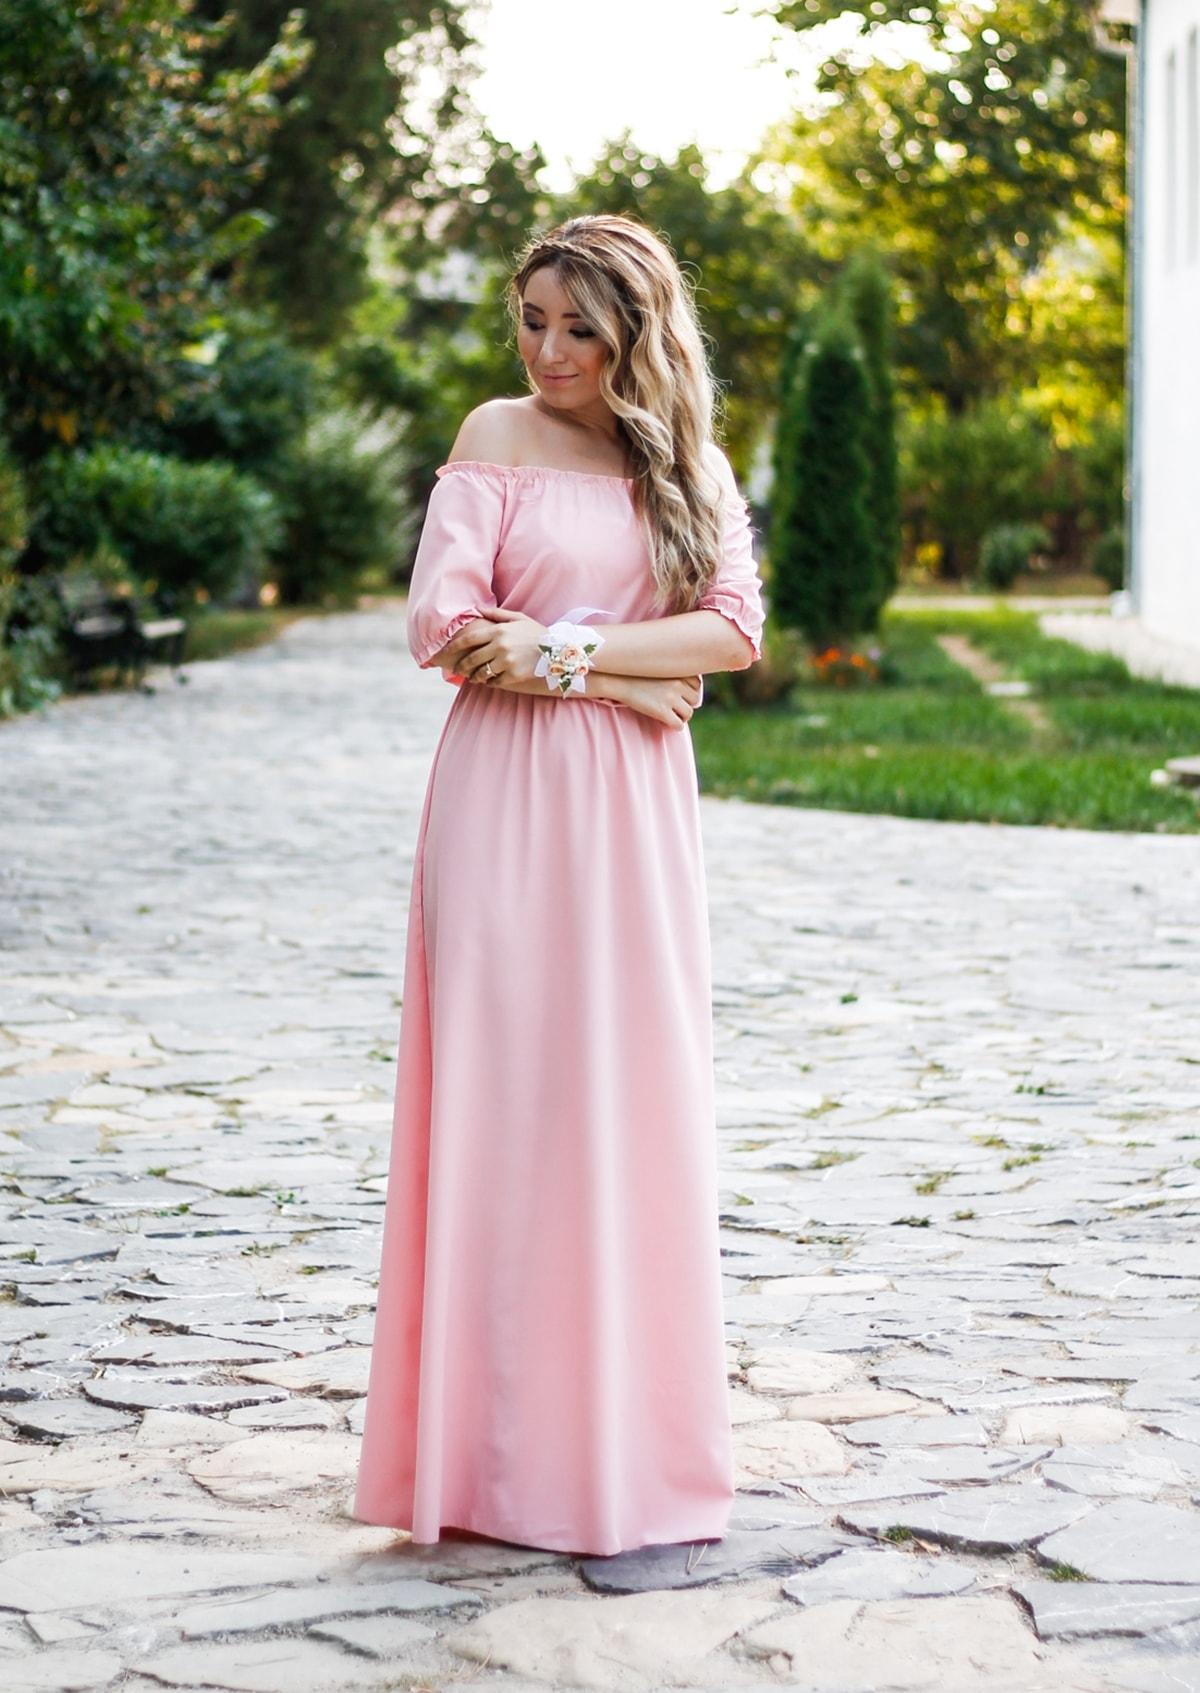 Andreea Ristea - rochie de domnisoara de onoare, umerii goi, roz pal, piersicuta, roz pudra, rochie, nunta, ocazie